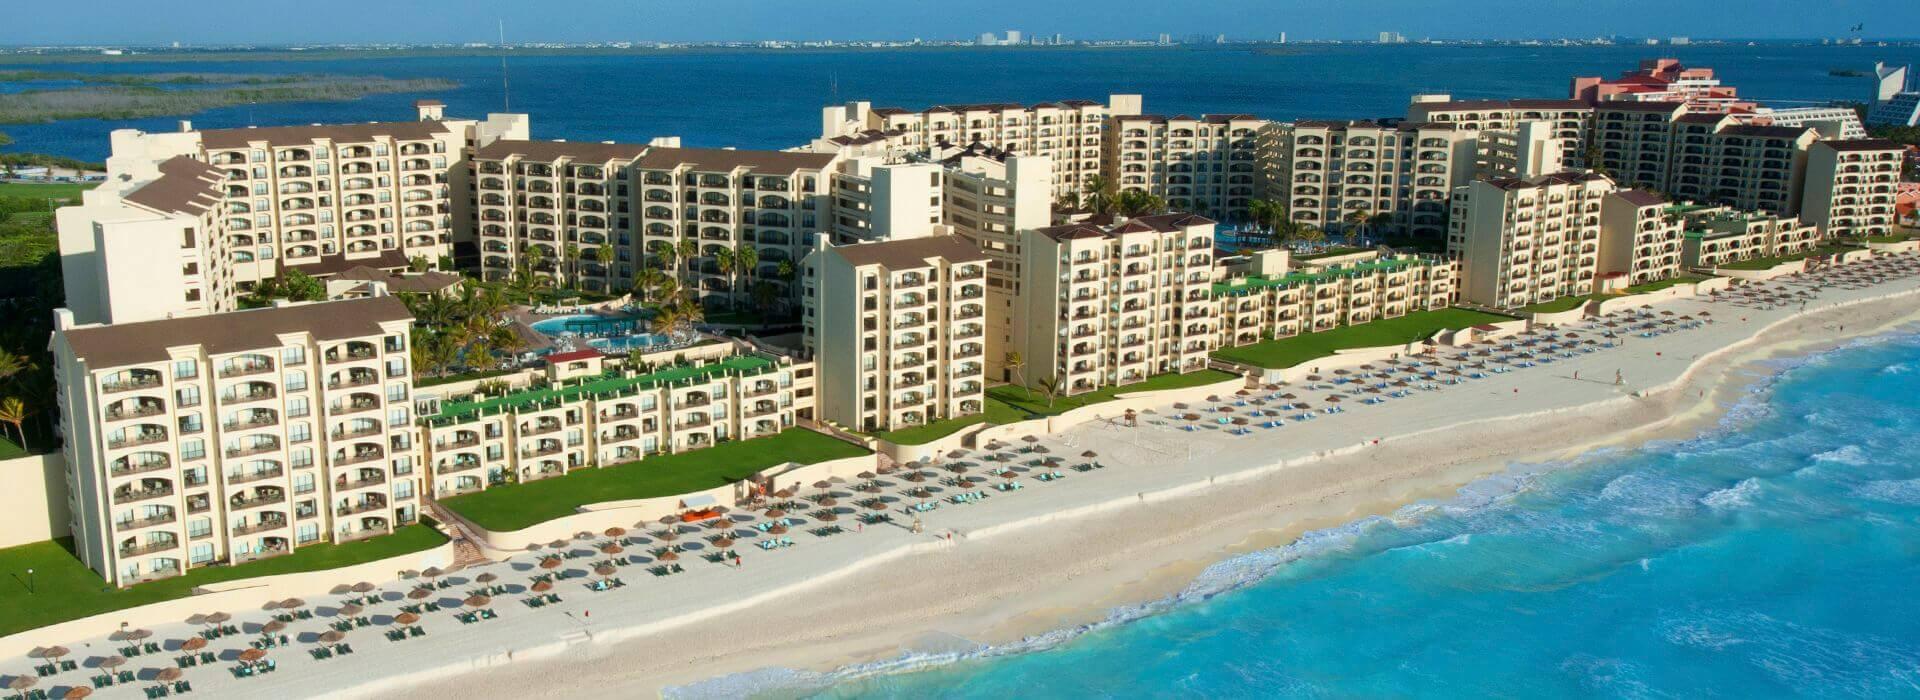 The Royal Islander Cancun Resort